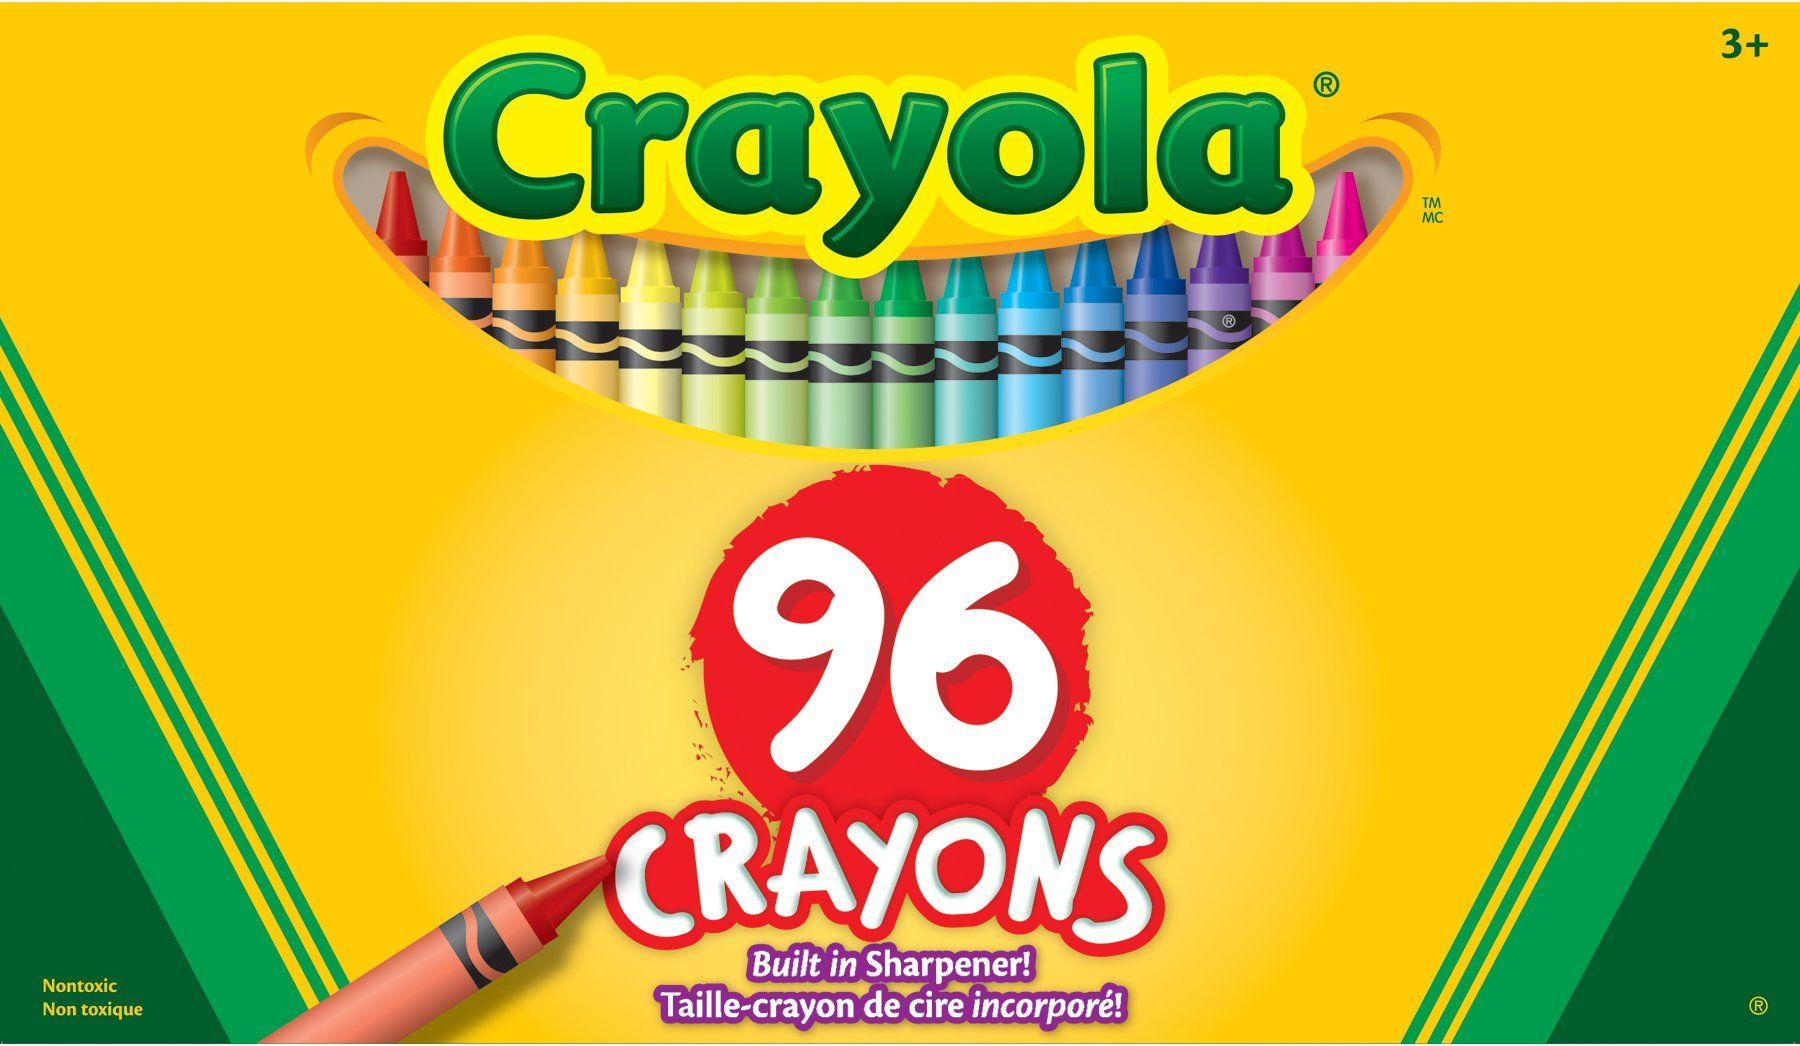 crayola 96 crayons kat s birthday wish list pinterest crayons